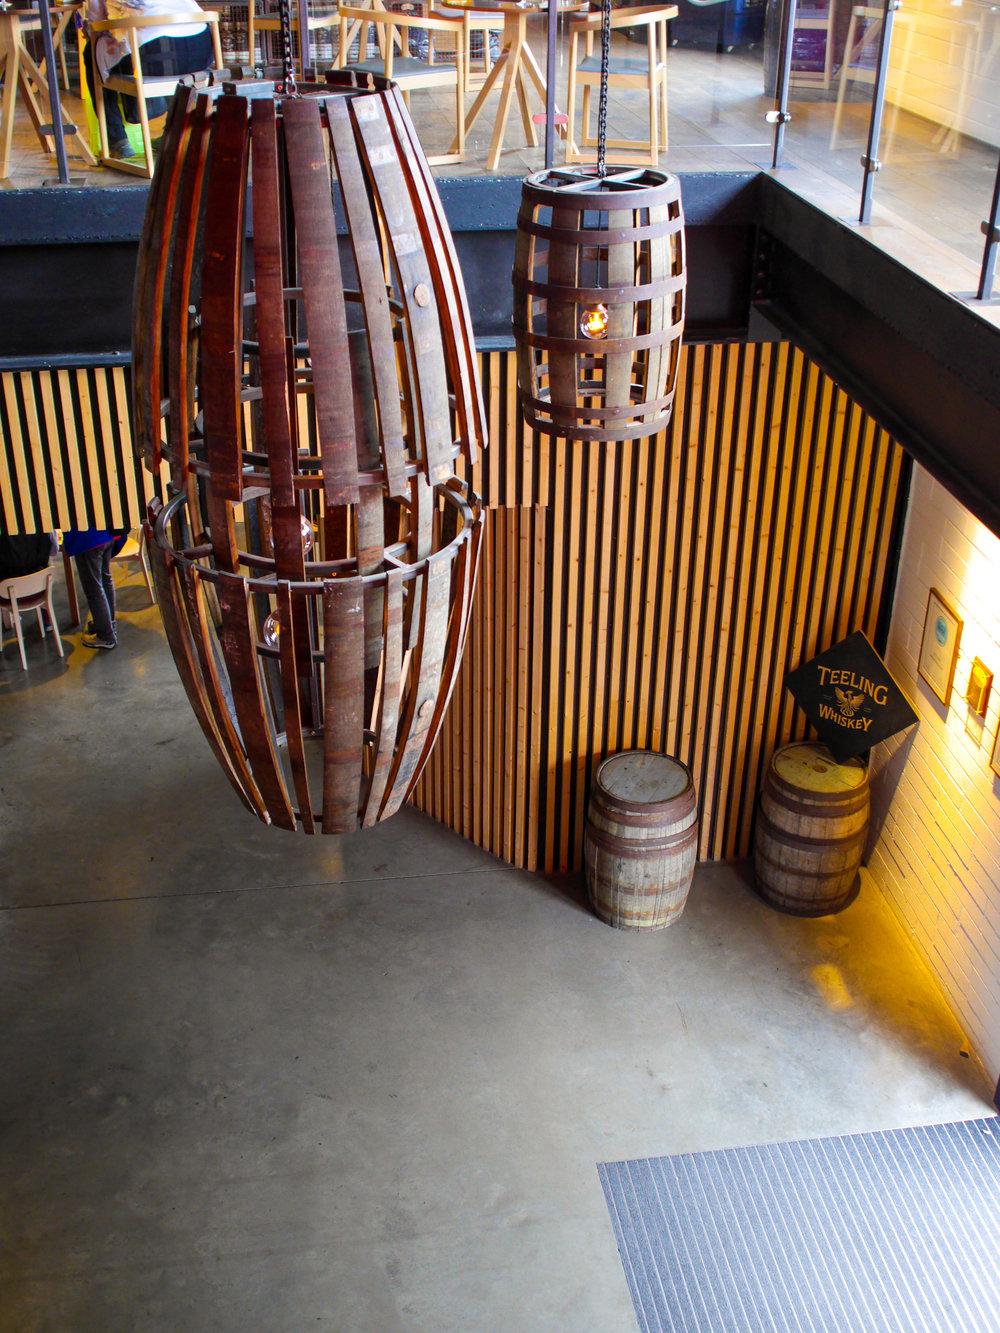 Entryway at Teeling Distillery in Dublin, Ireland